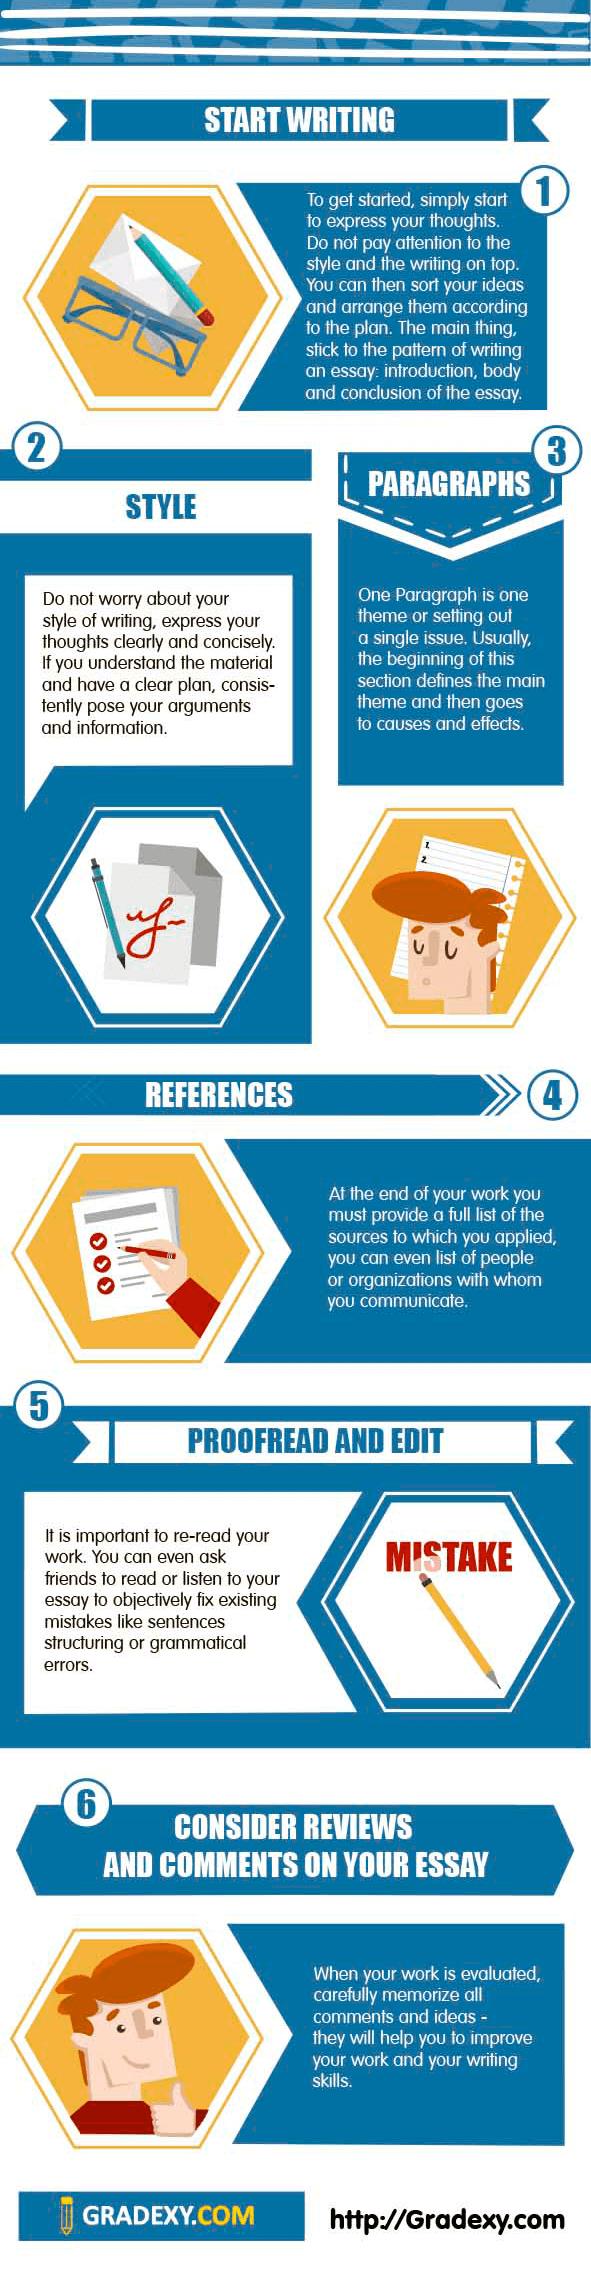 advice on writing essay infographics 2